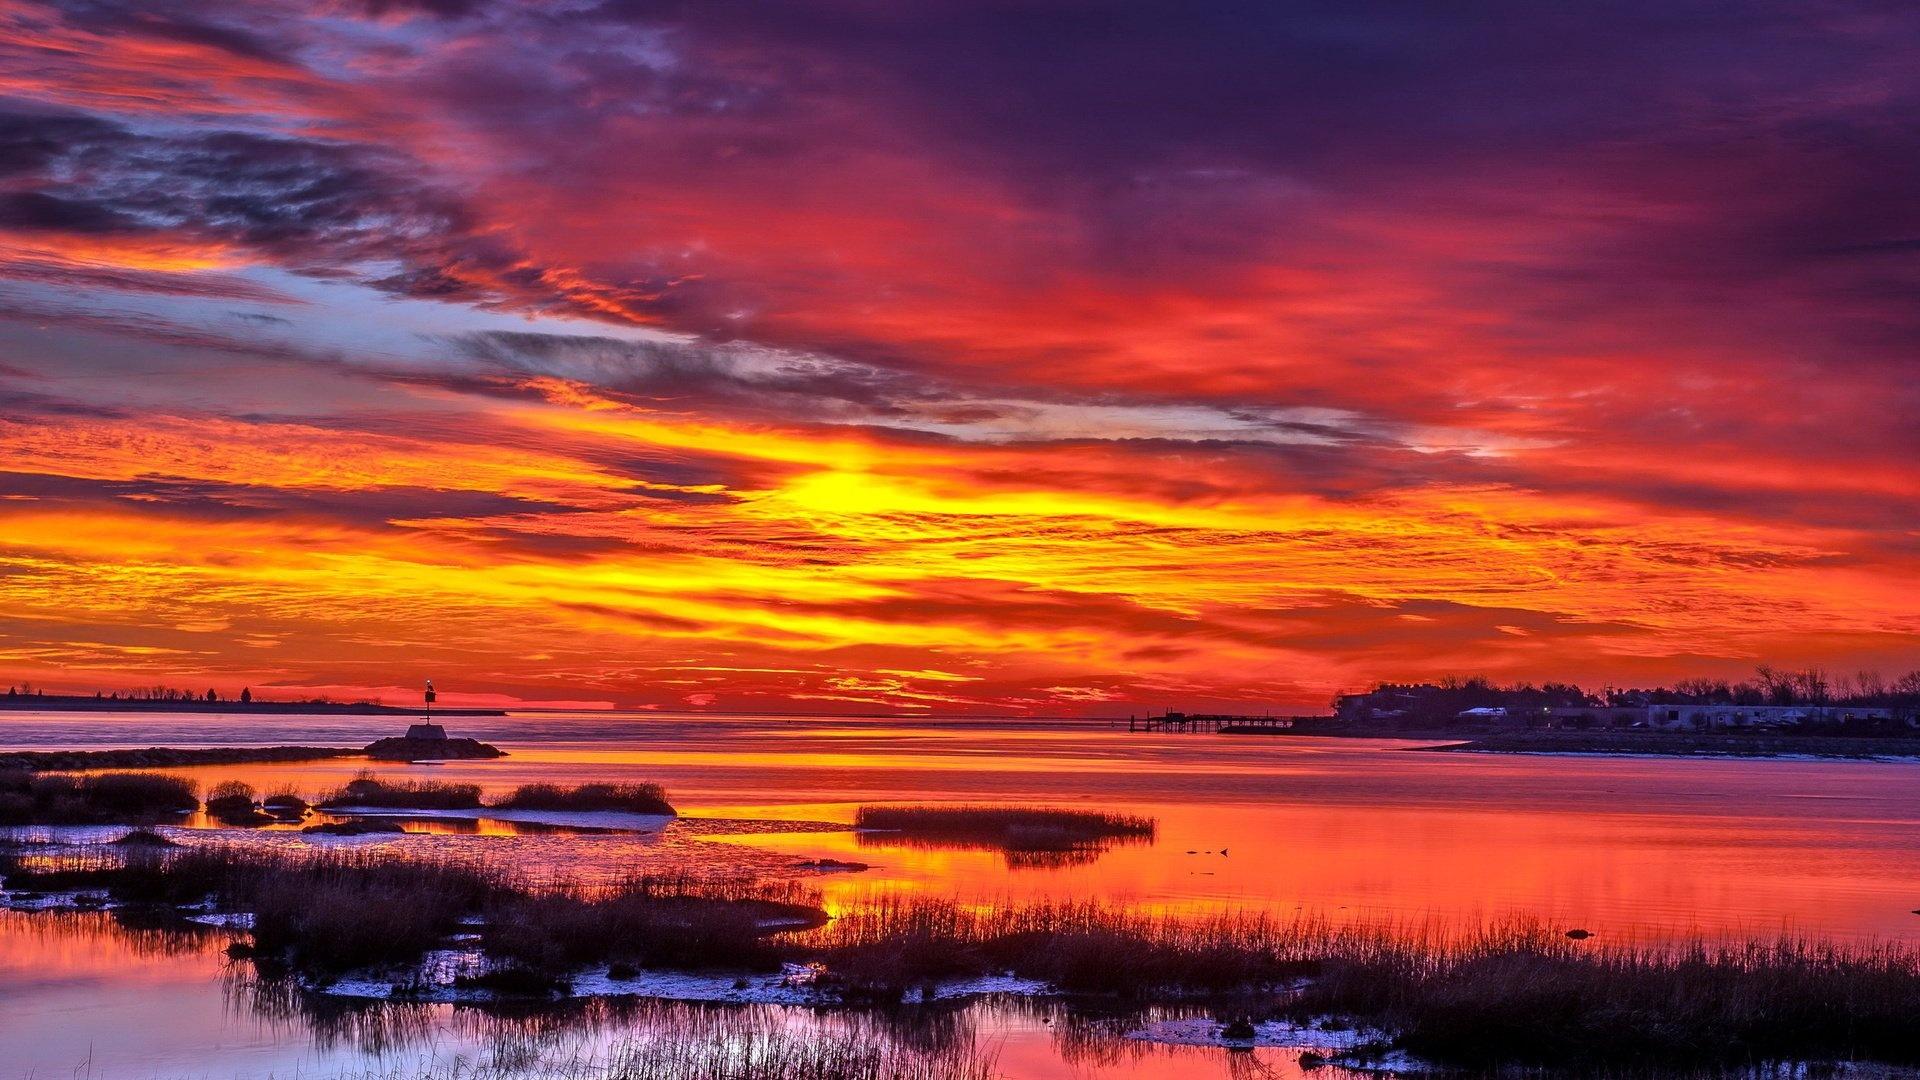 Sunset computer background